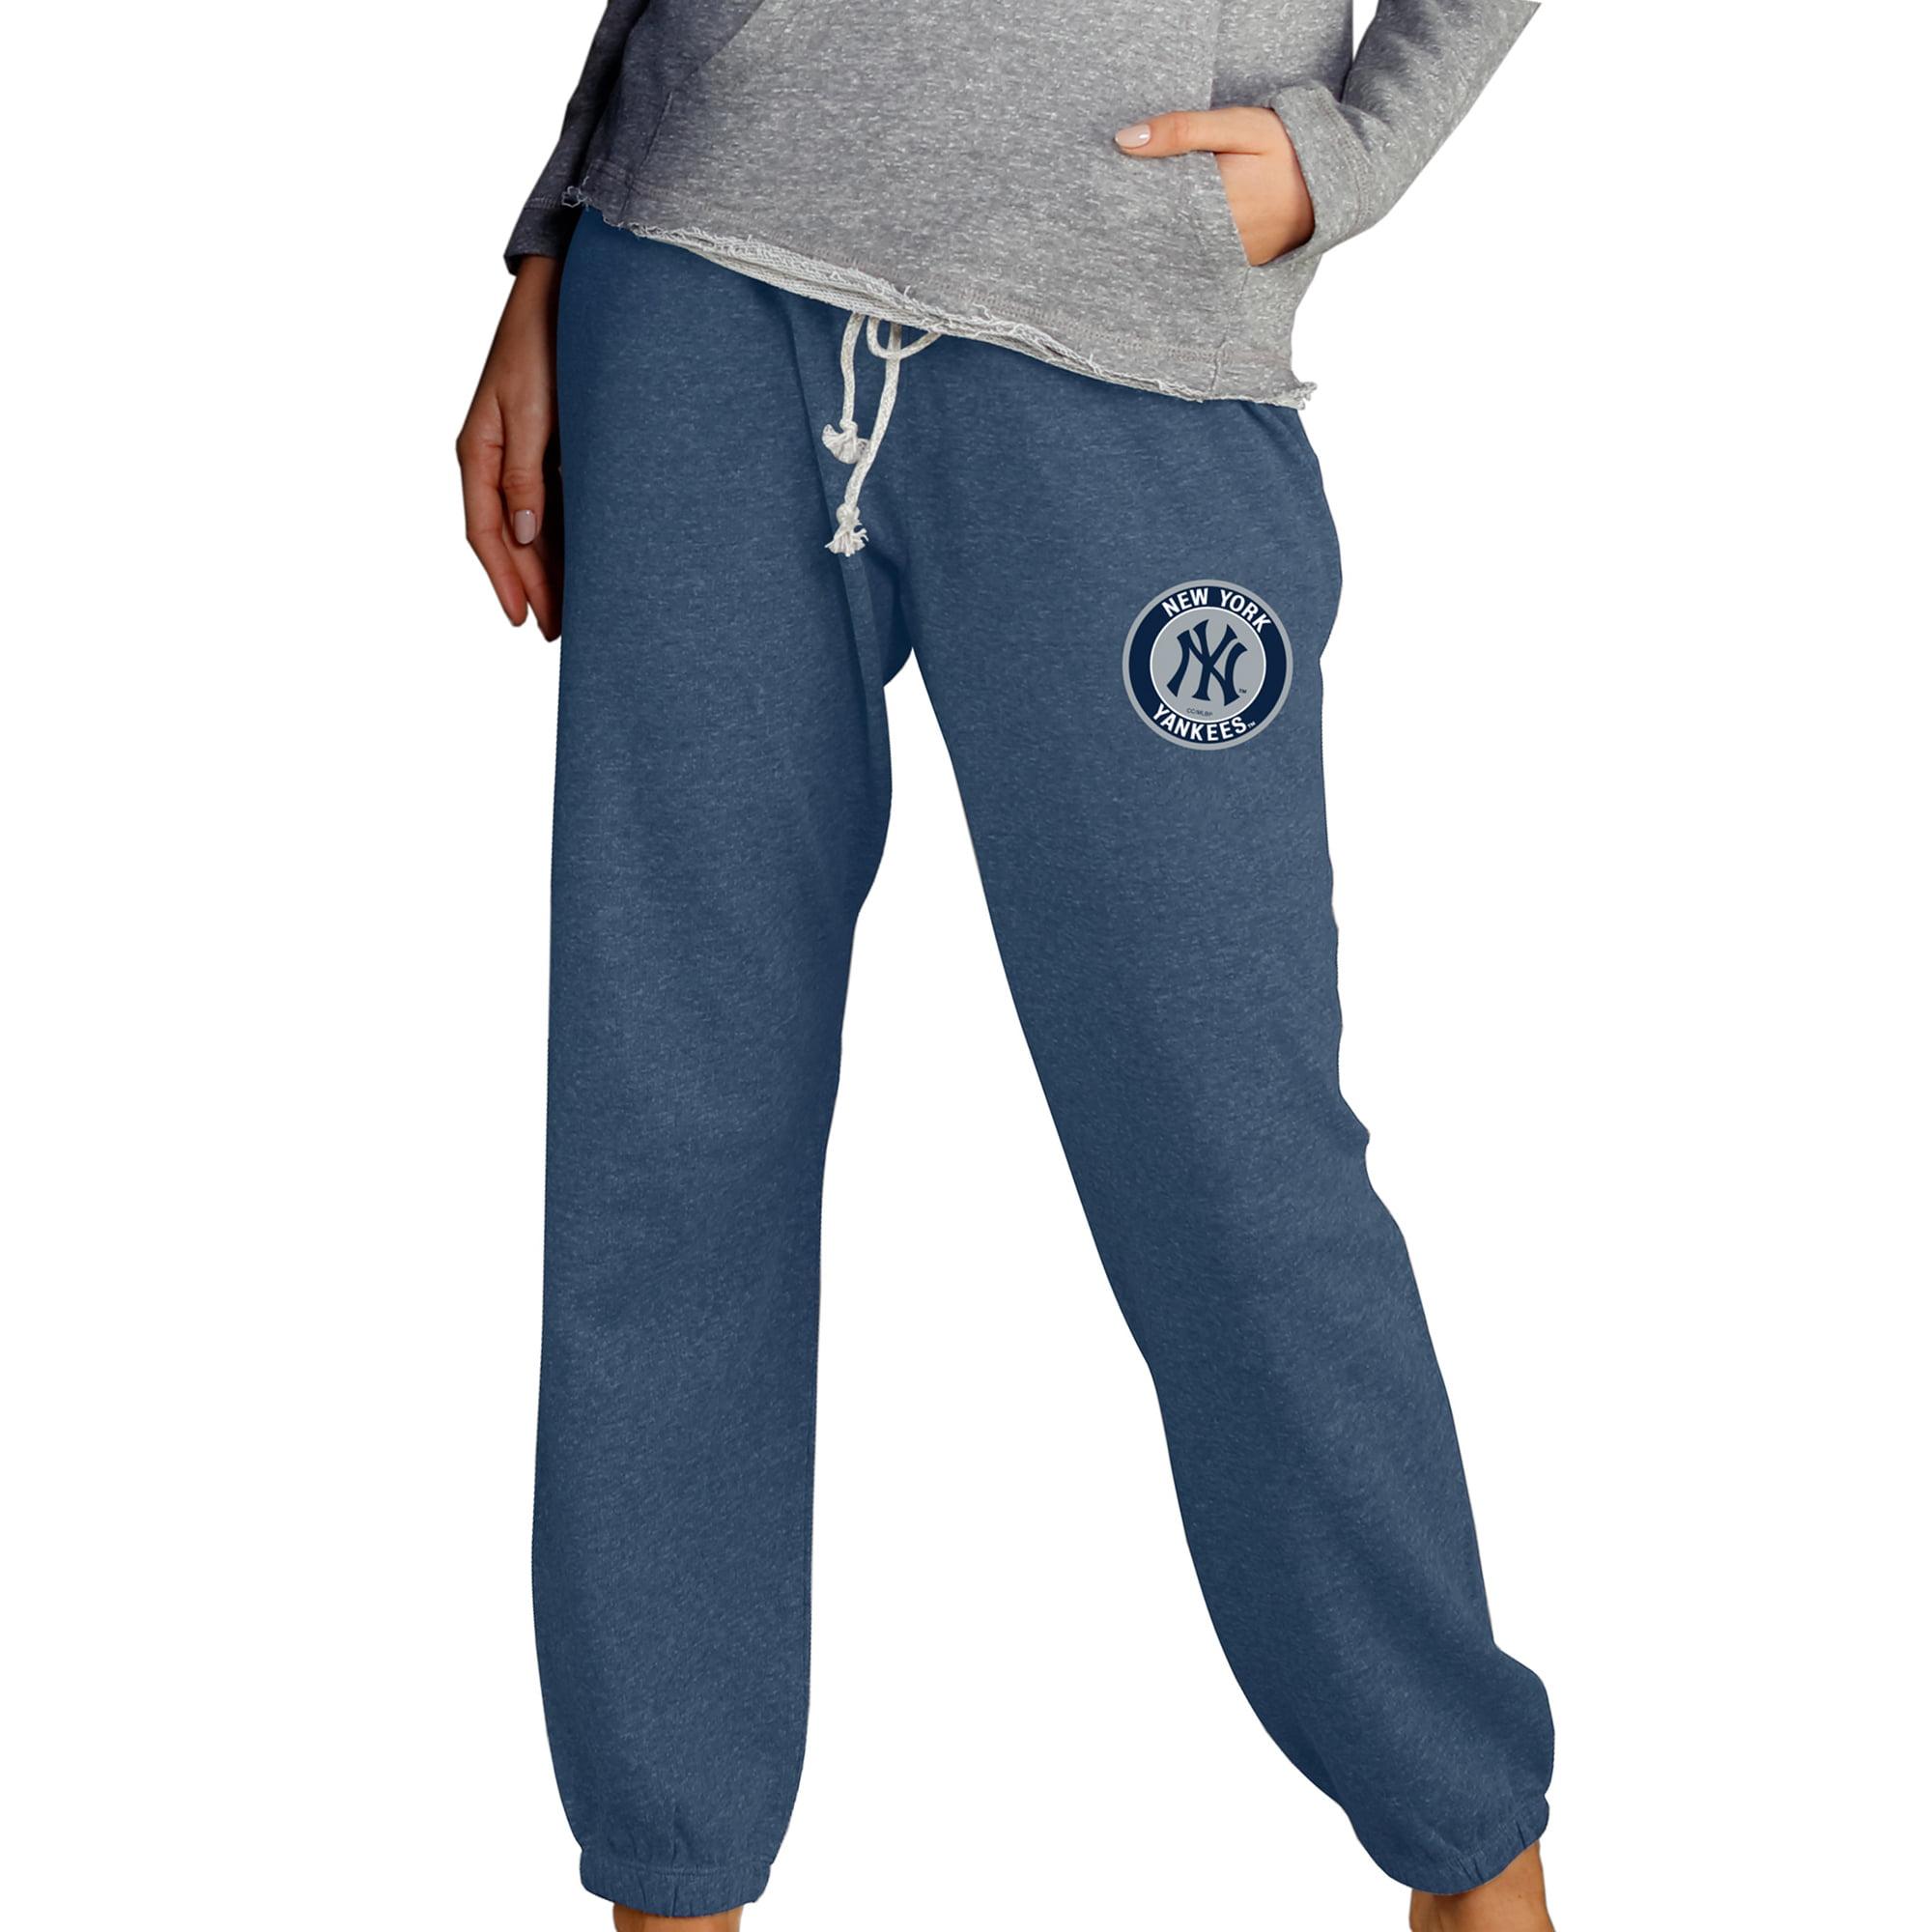 New York Yankees Concepts Sport Women's Mainstream Knit Pants - Navy